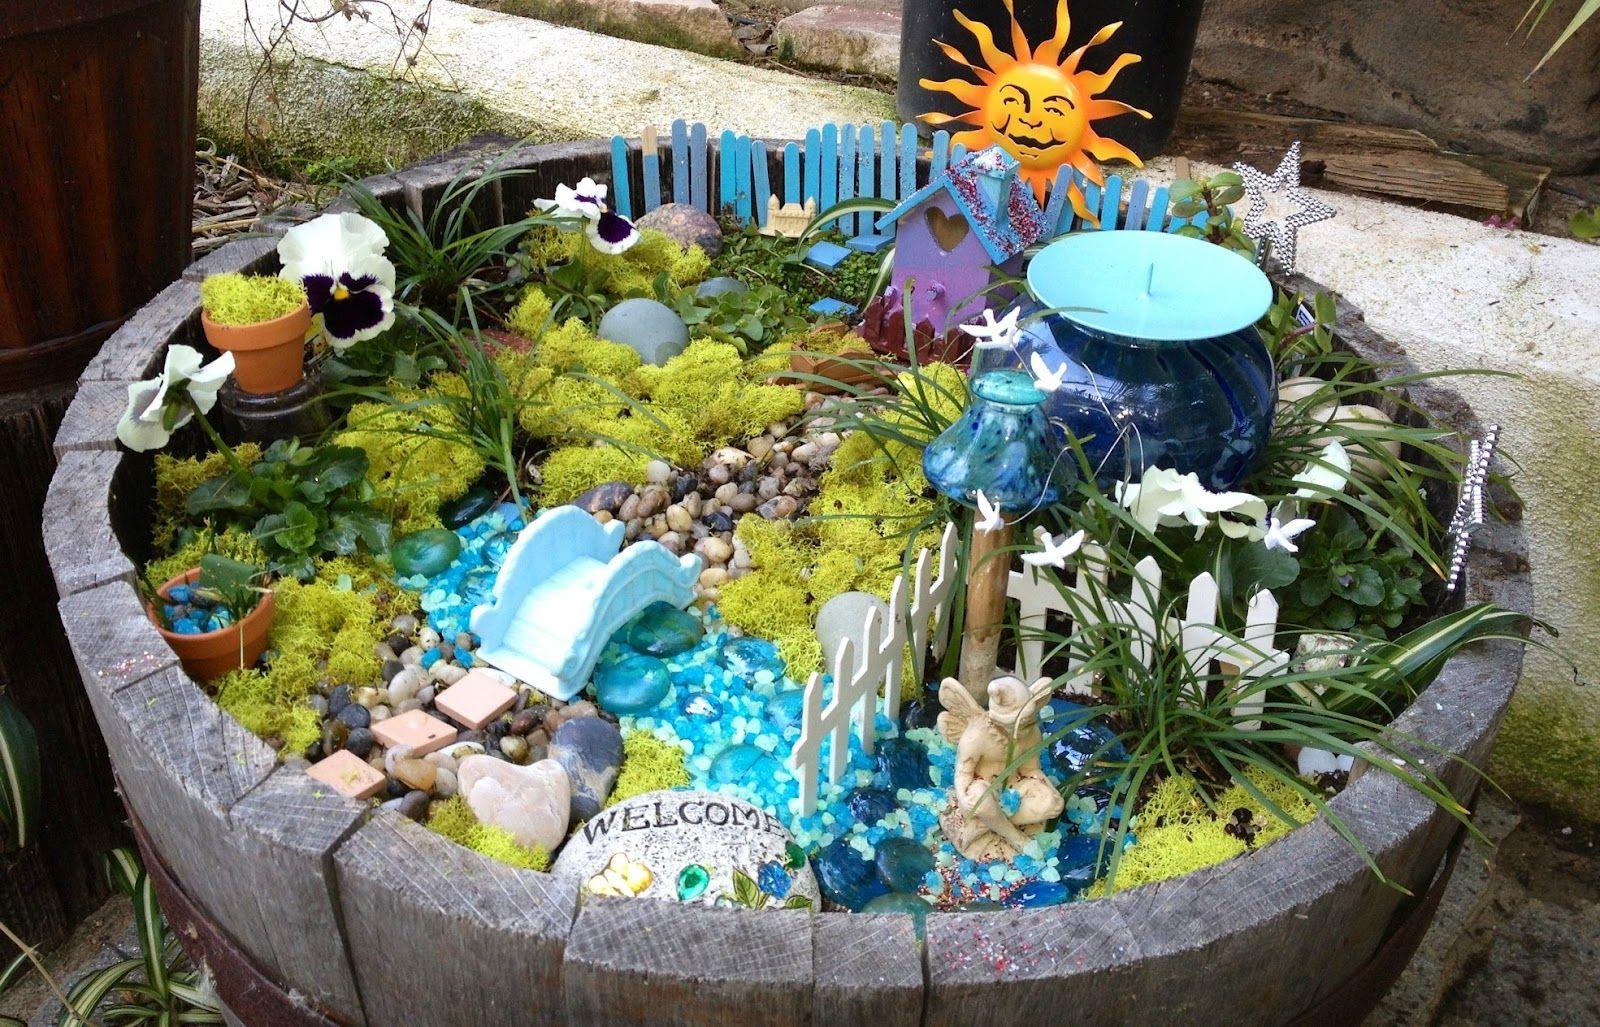 24 best fairy garden images on pinterest mini gardens fairies garden and miniature fairy gardens. beautiful ideas. Home Design Ideas